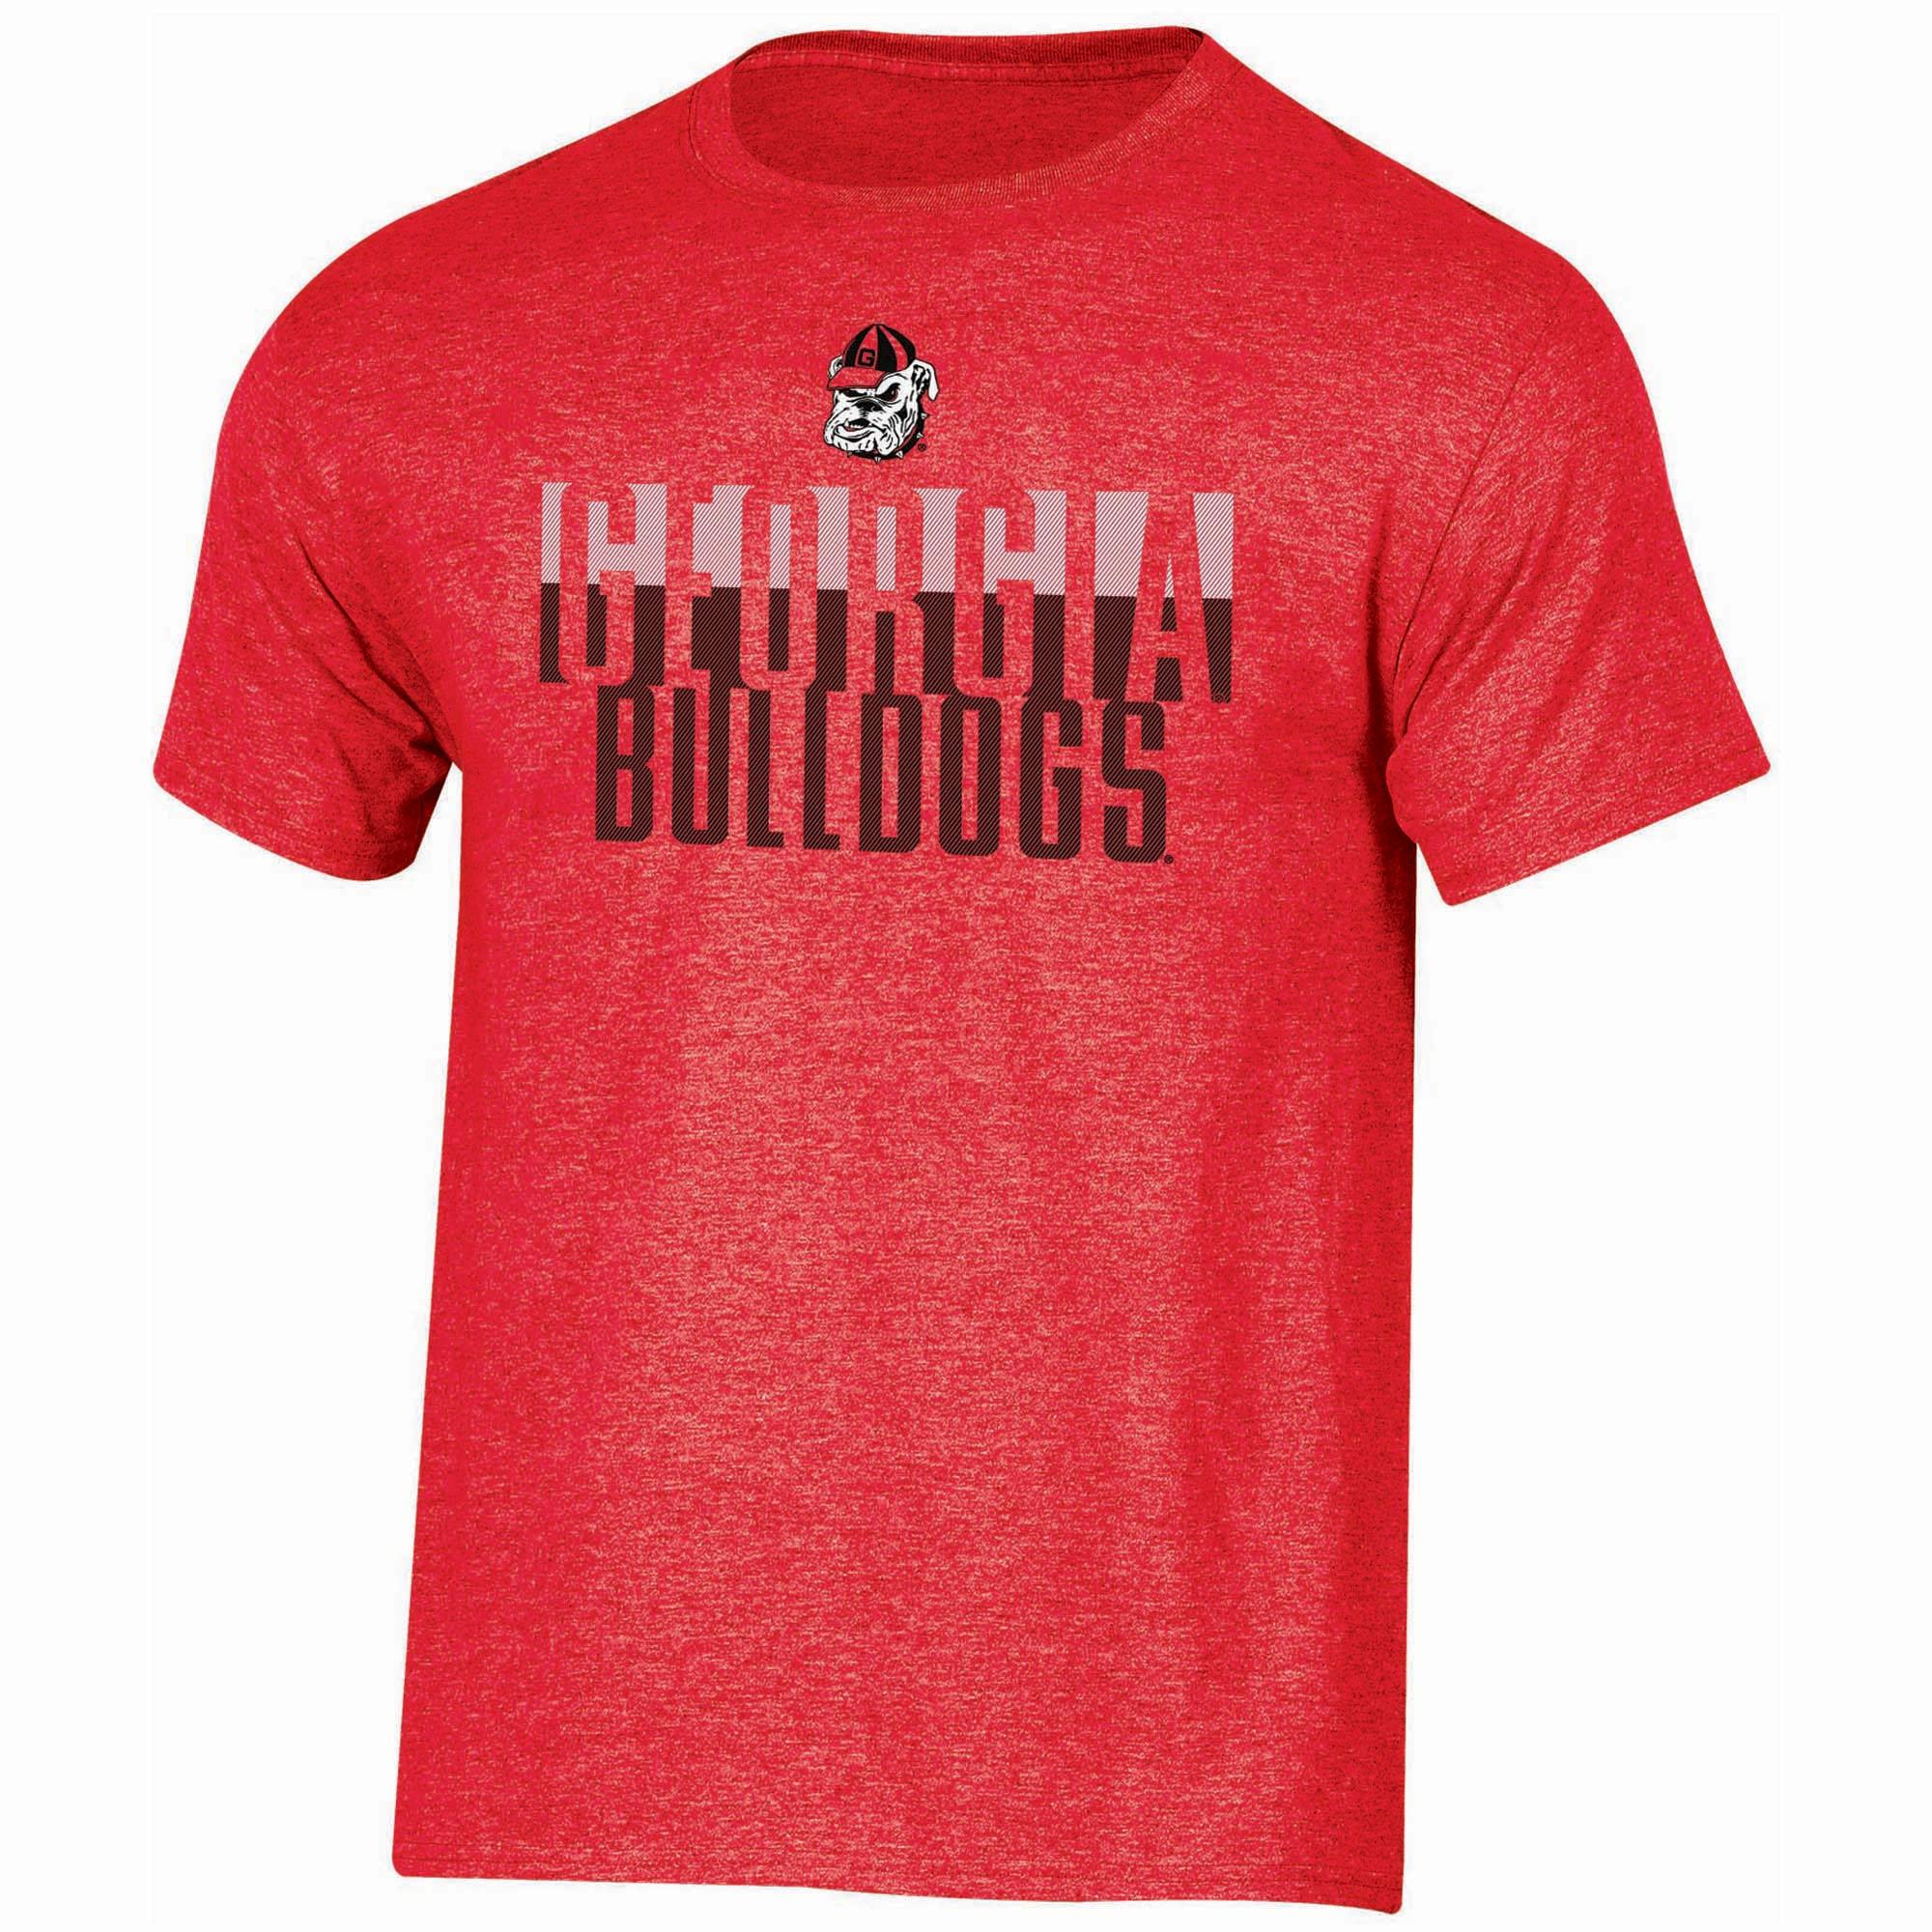 Men's Russell Red Georgia Bulldogs Textured Trend Crew Neck T-Shirt